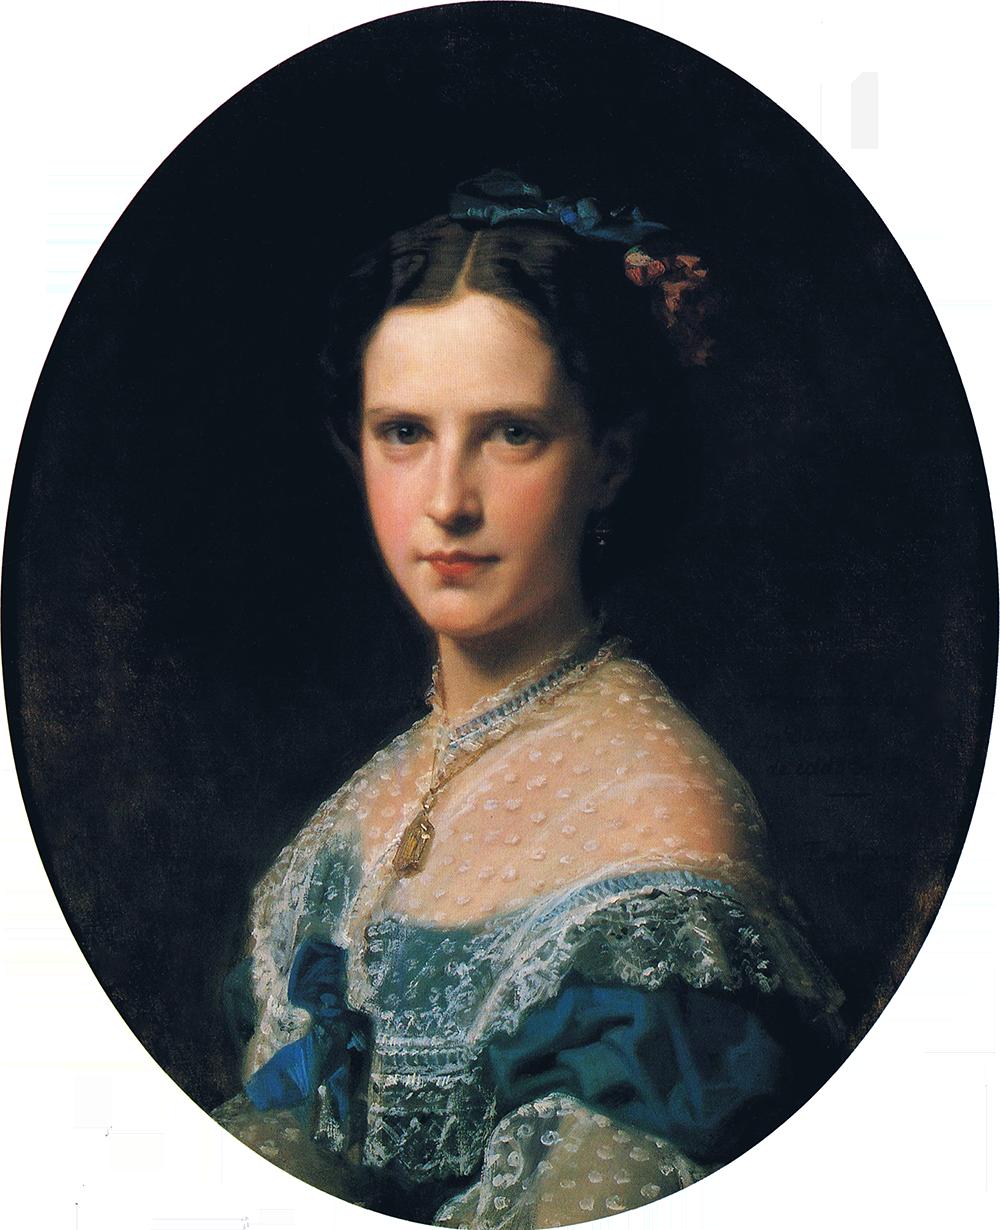 Luisa de Carvajal